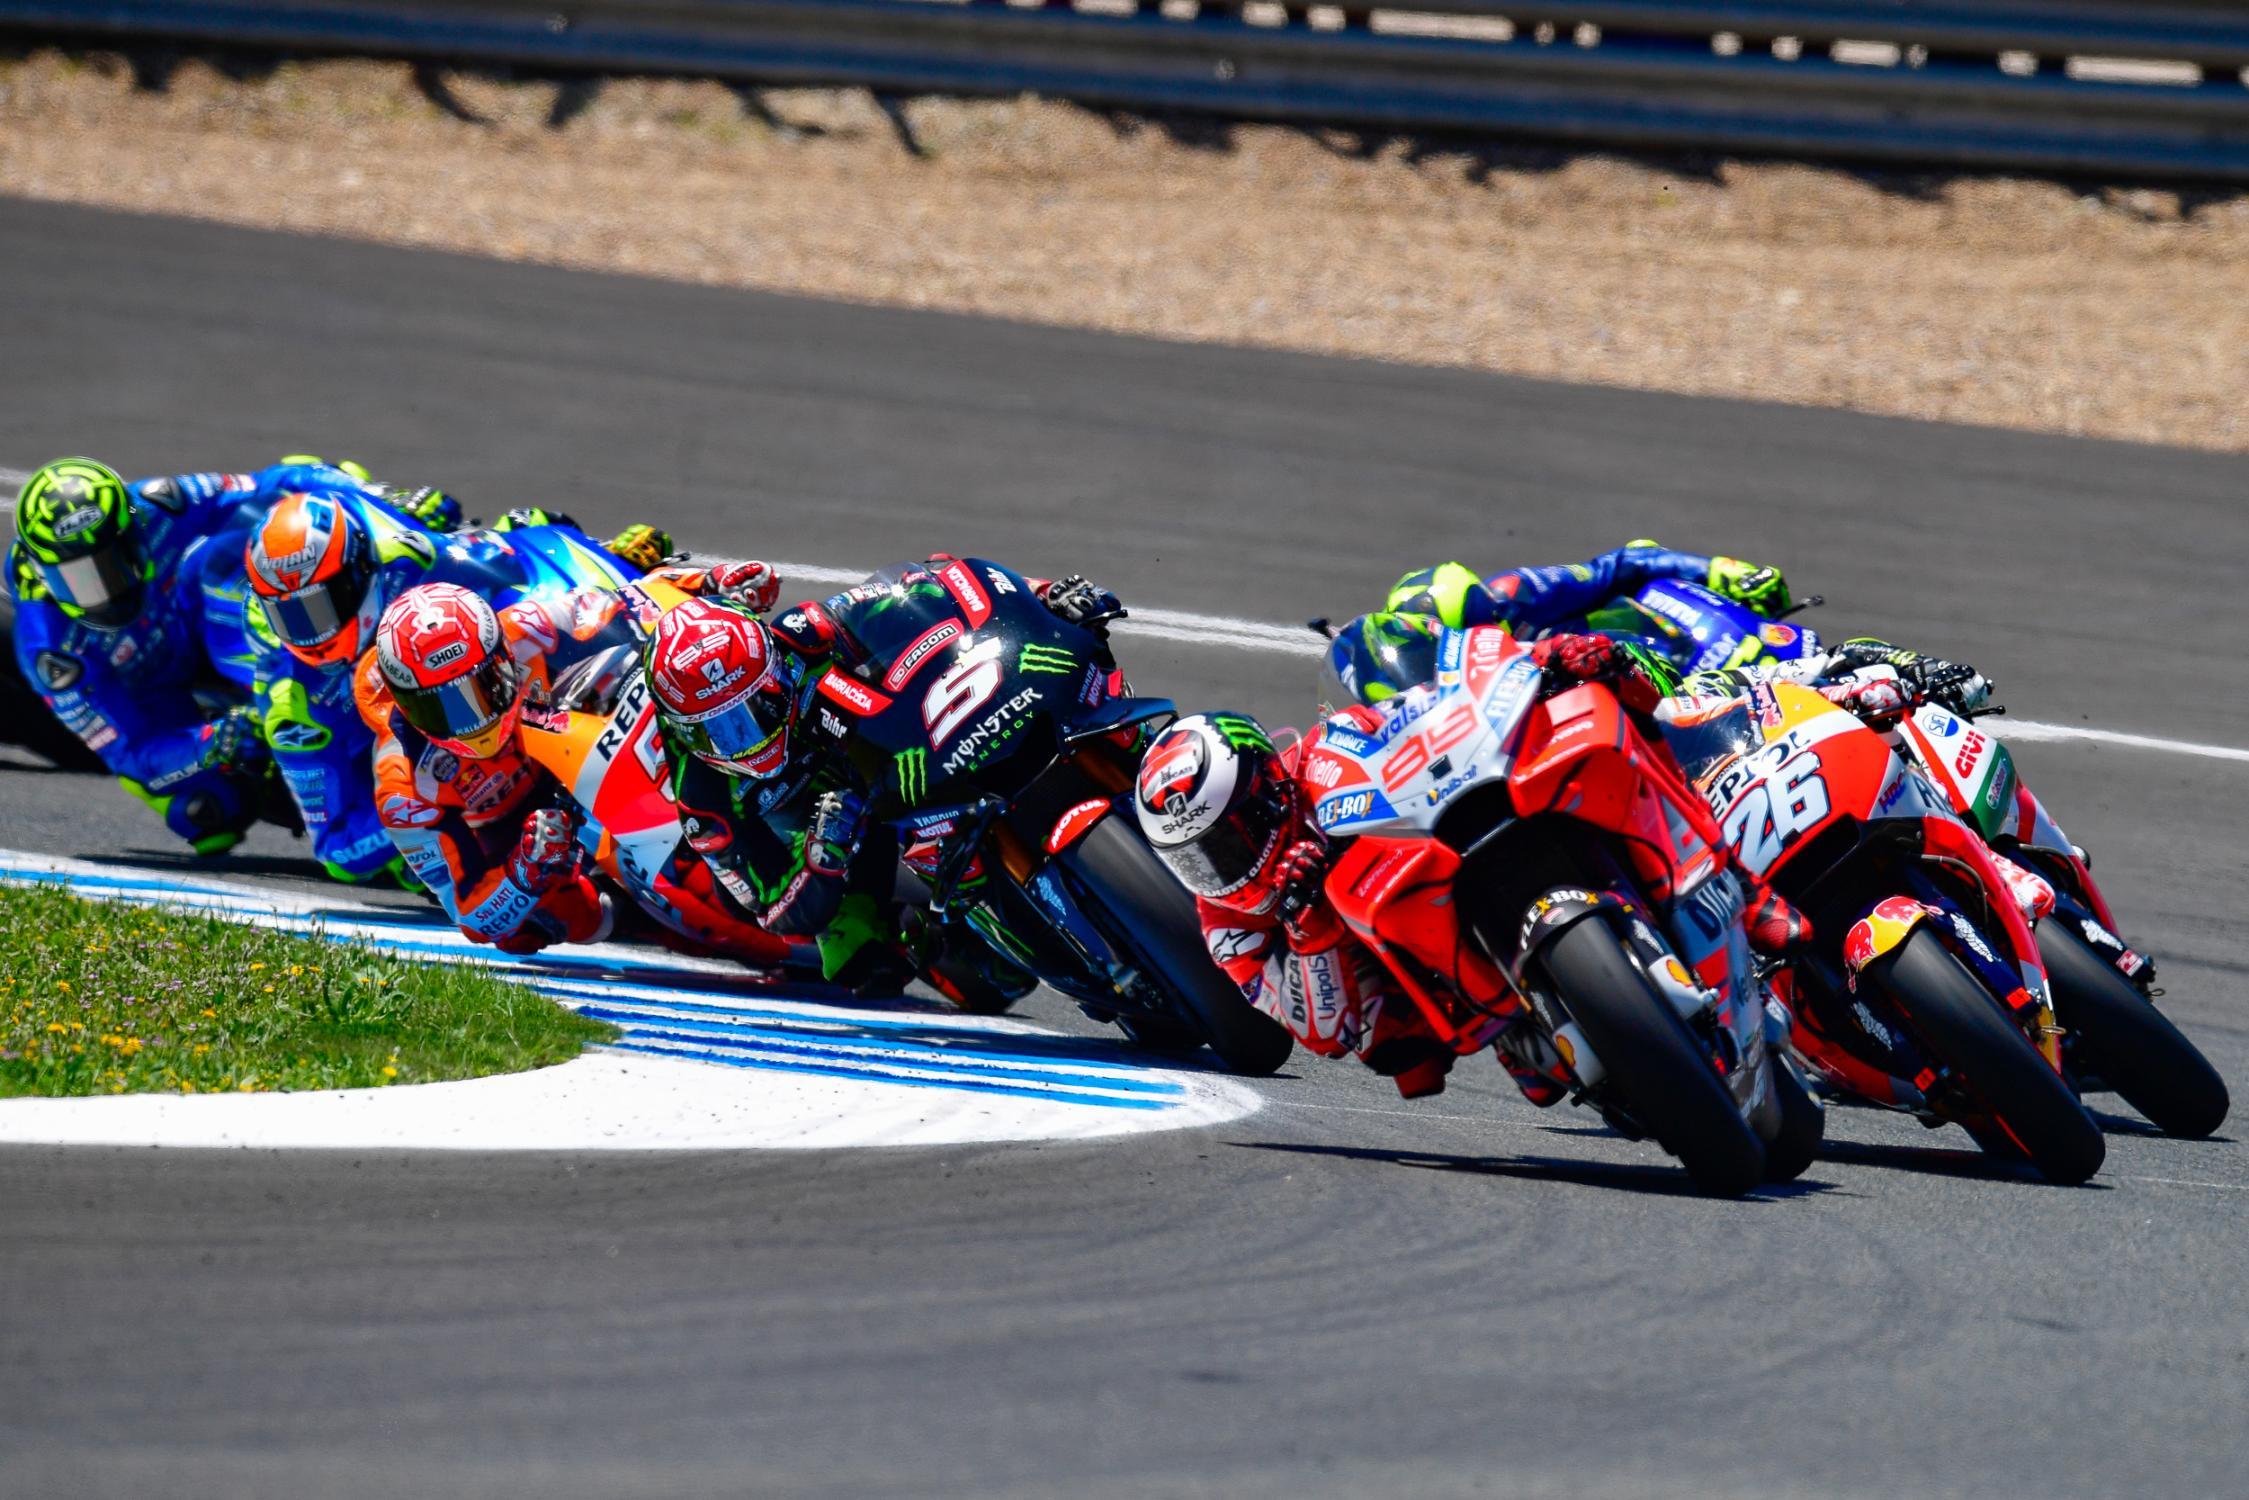 [GP] Jerez 99-jorge-lorenzo-esp_ds56307.jpg.gallery_full_top_fullscreen